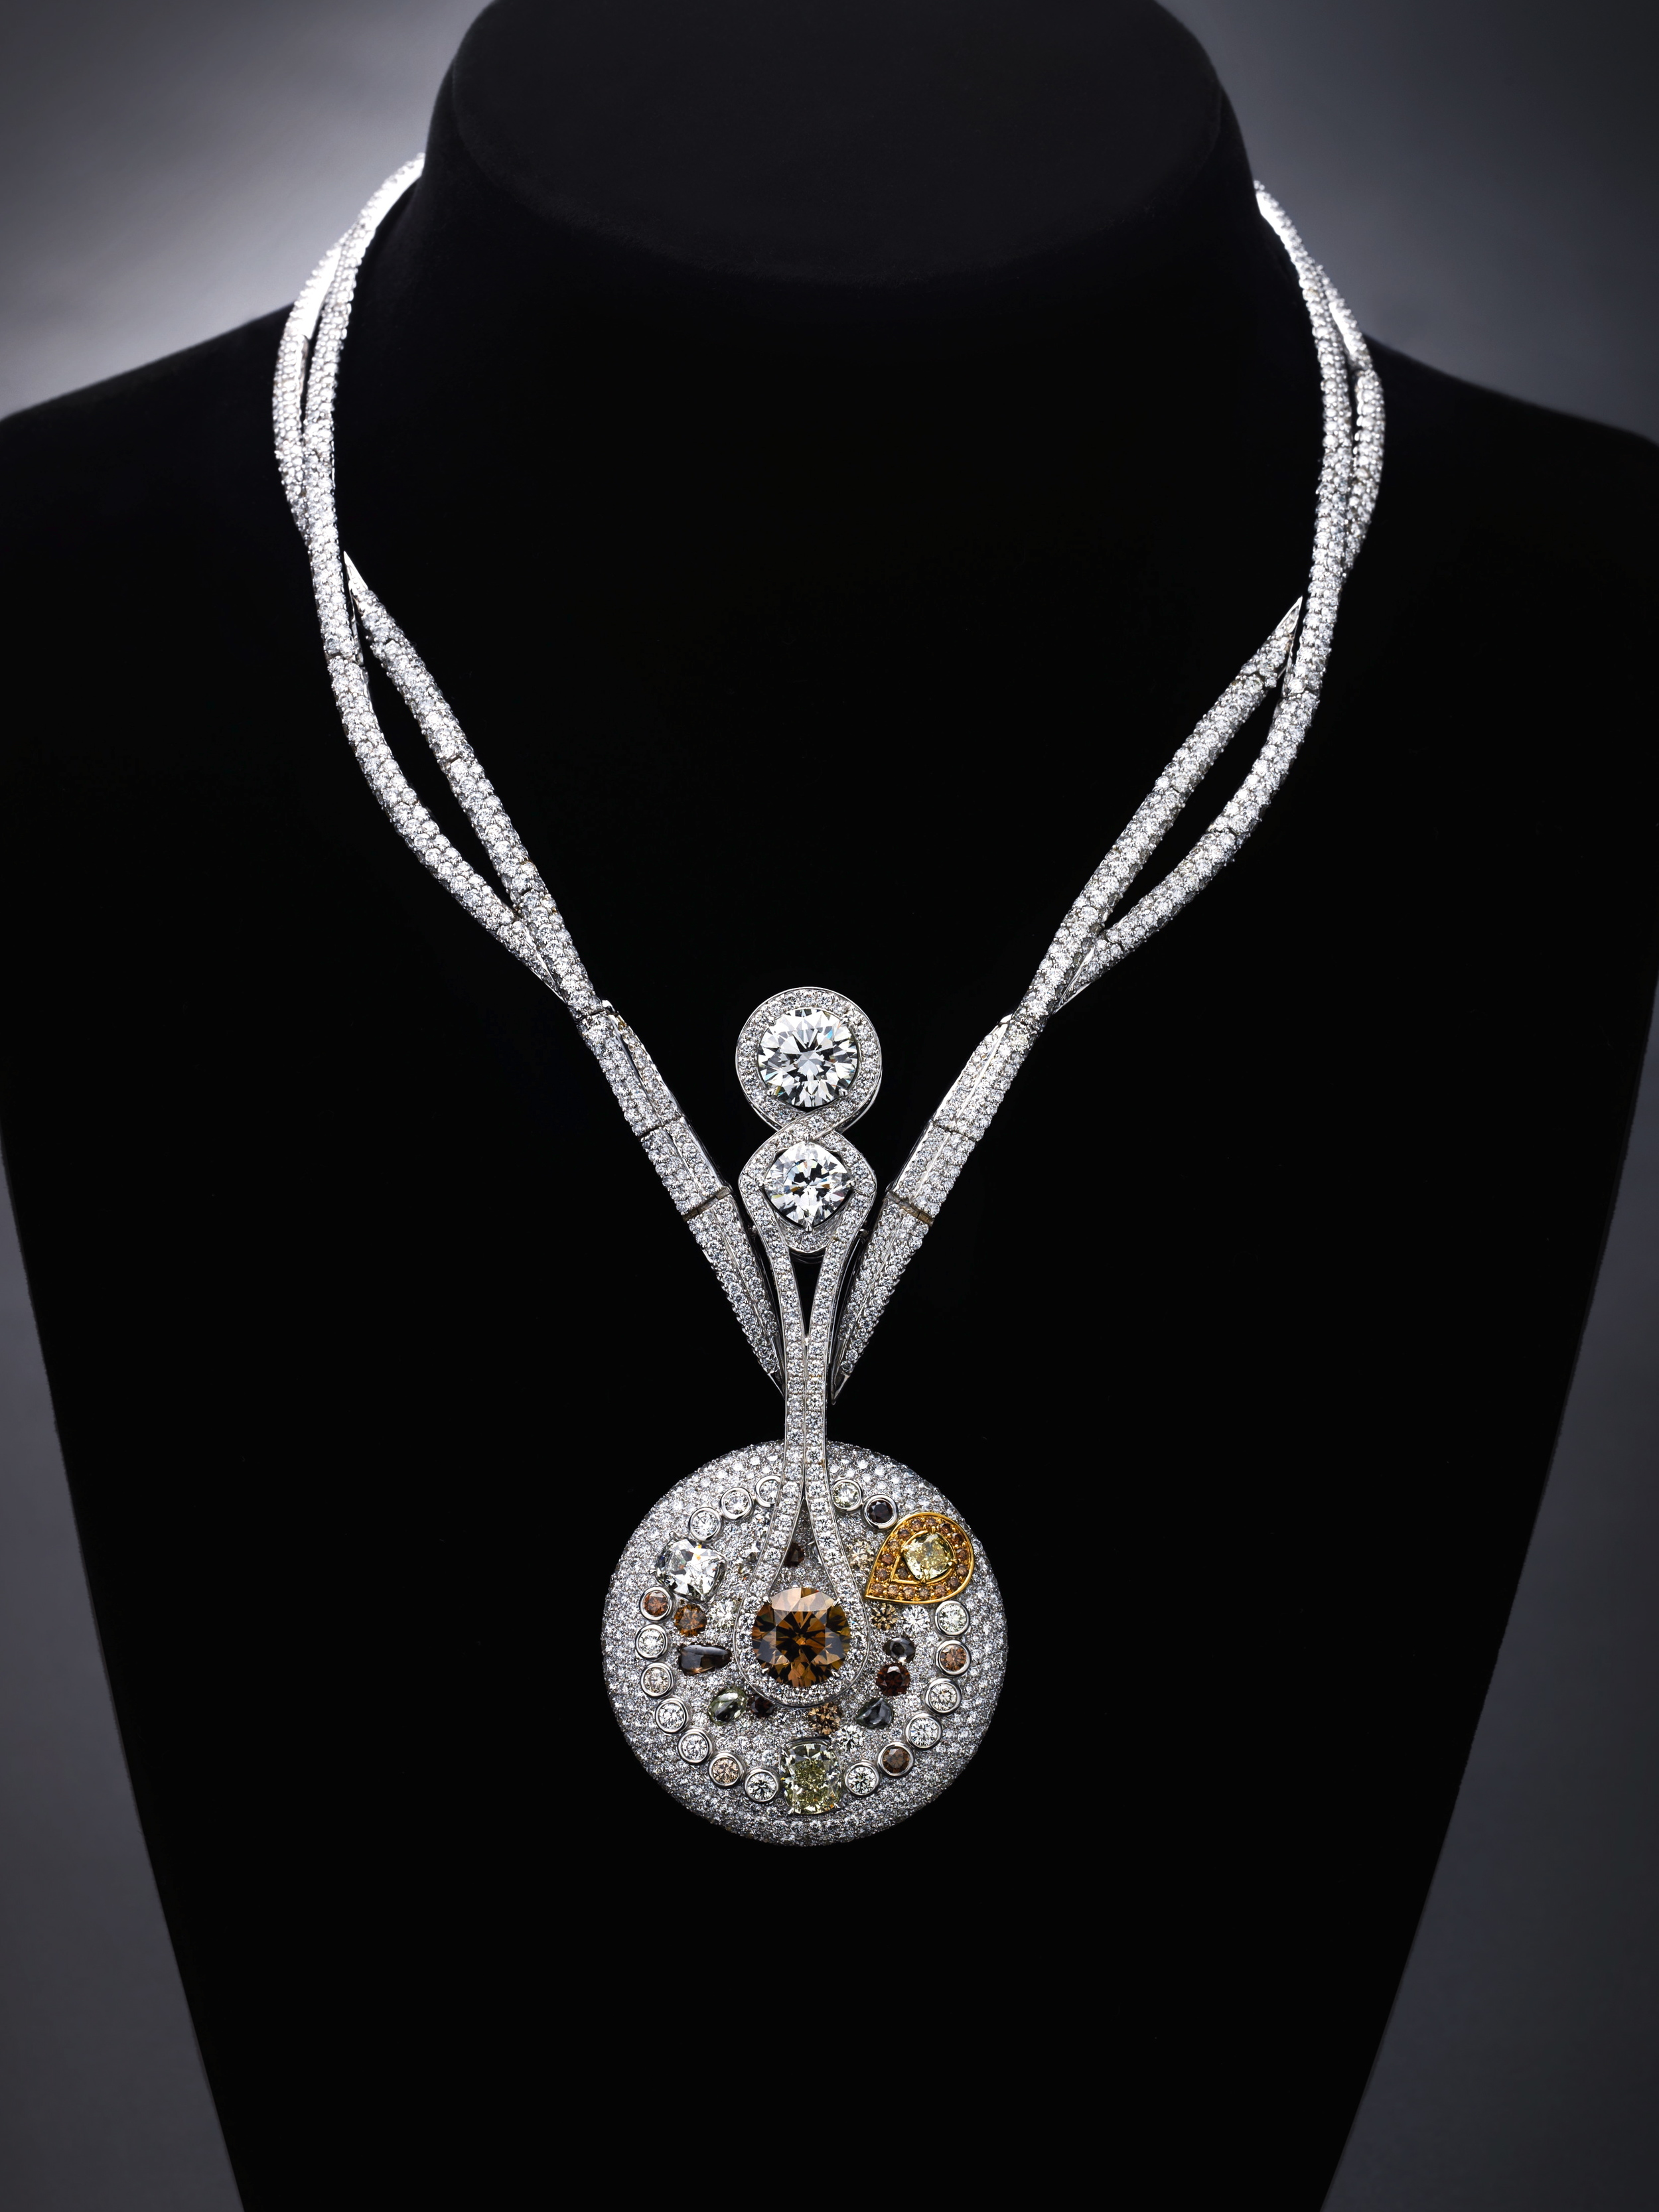 Rio Tinto Bunder Diamonds_Reena Ahluwalia Necklace.jpg